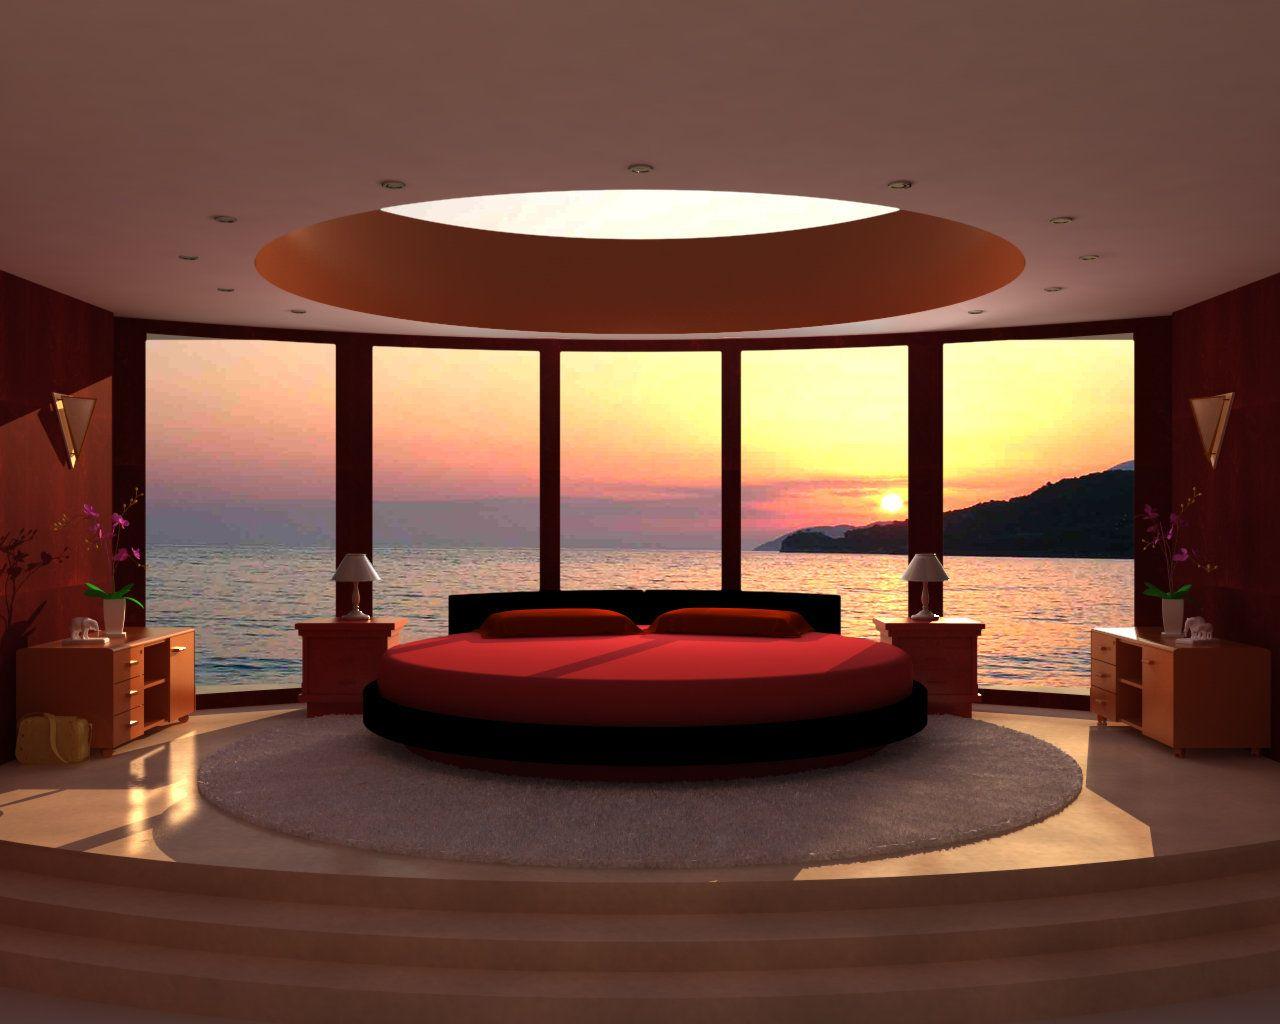 Red Unique Bedroom Design « Bedroom Ideas, Interior Design And Many More